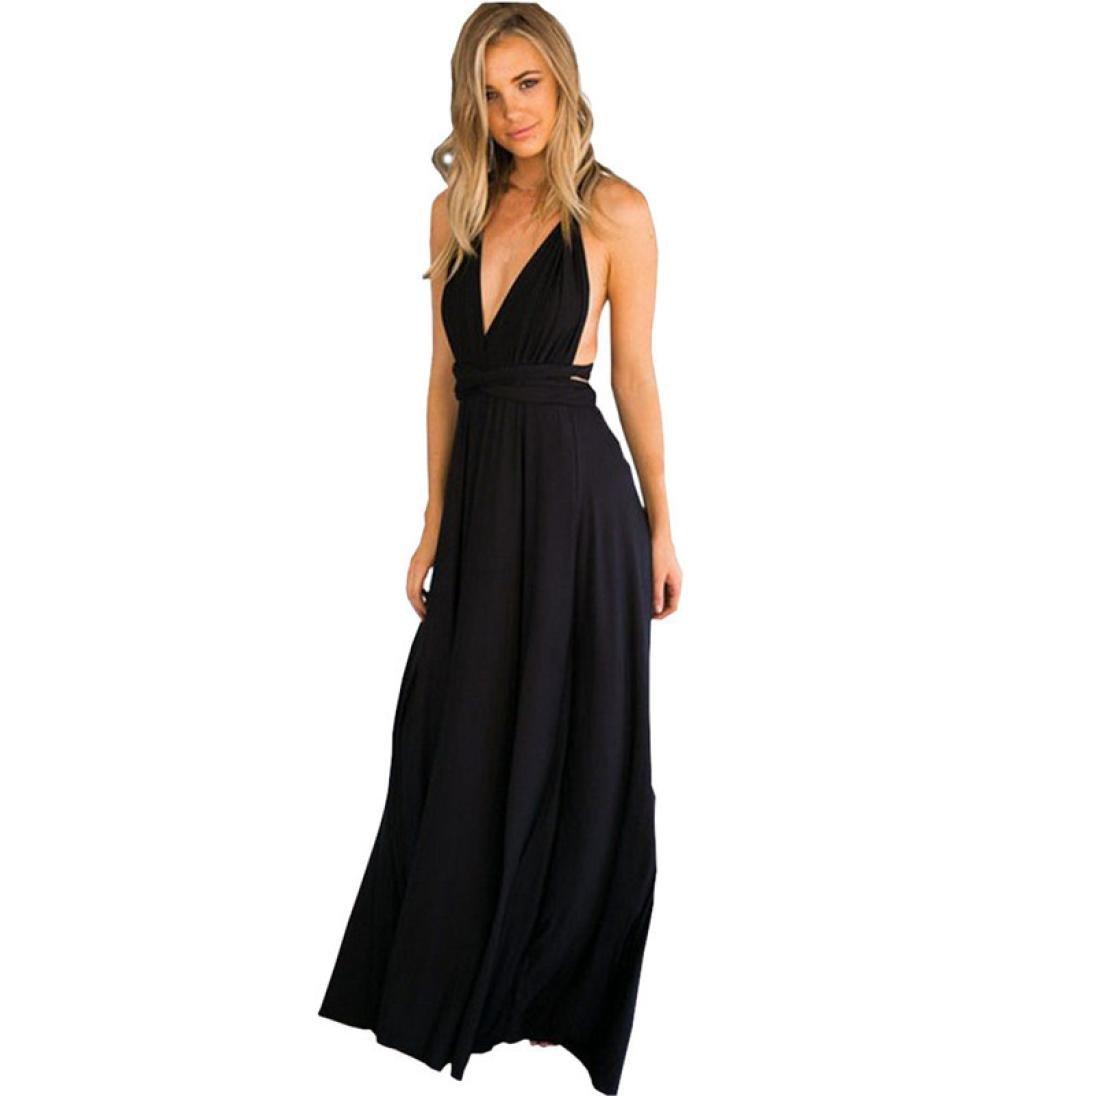 Yuxikong Women Long Dress, Sleeveless Halter Bandage Party Evening Dress Elegant Maxi Dresses